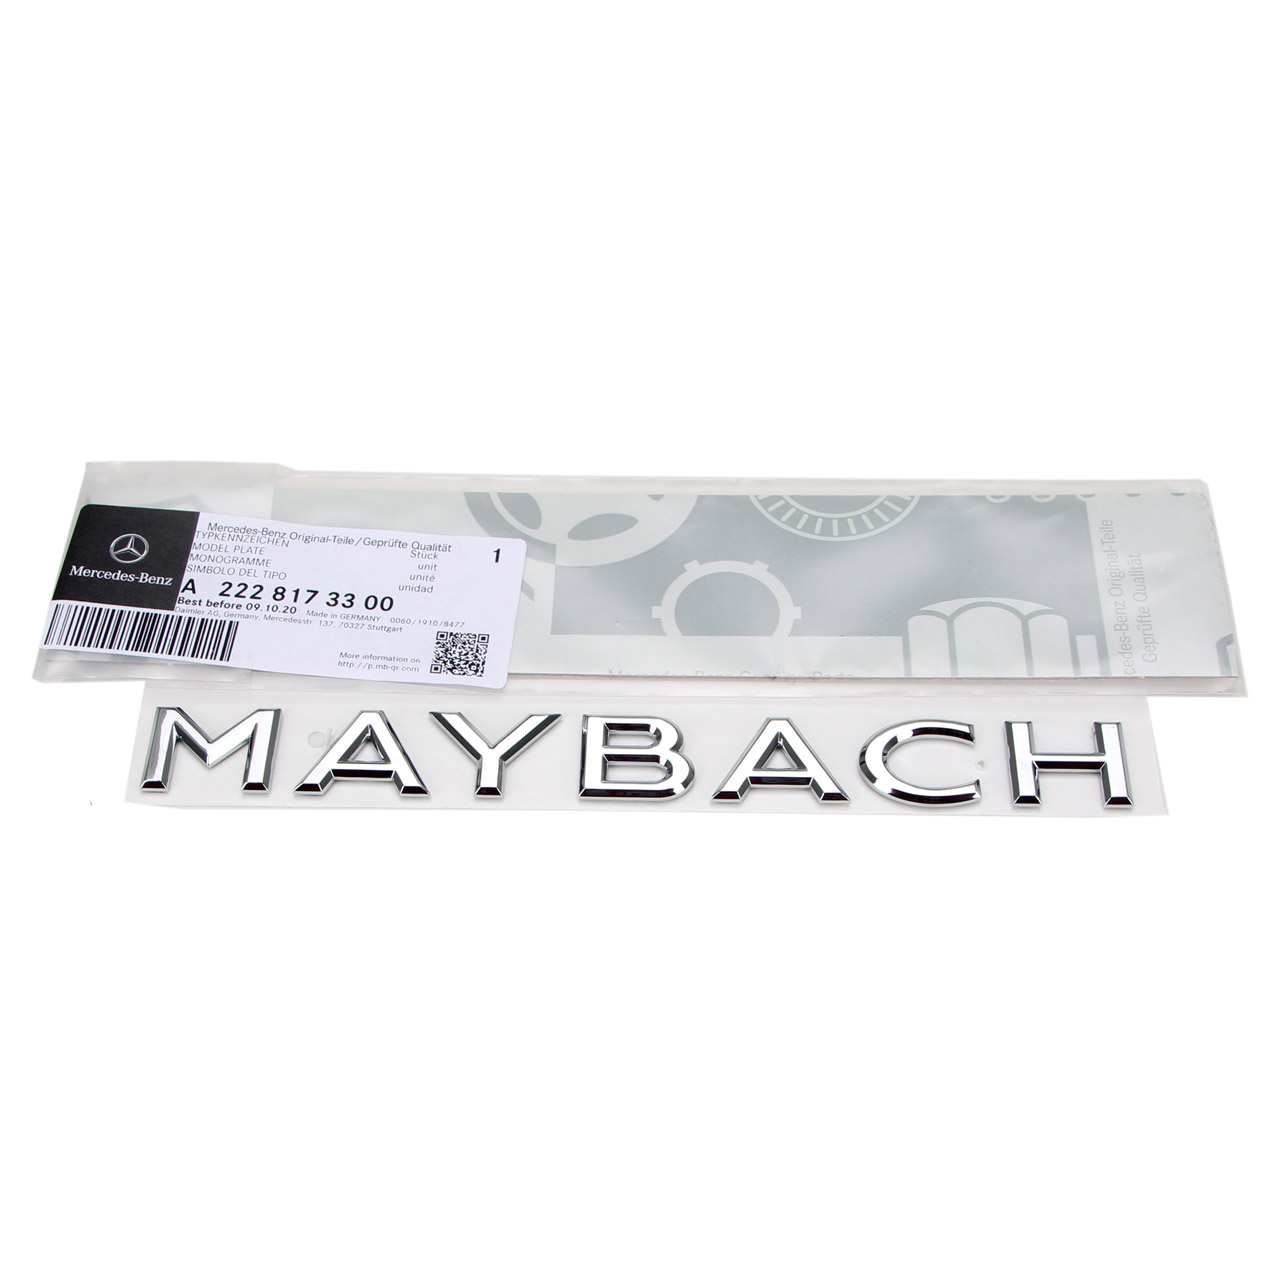 ORIGINAL Mercedes MAYBACH Emblem Logo Plakette W463 W222 hinten 2228173300